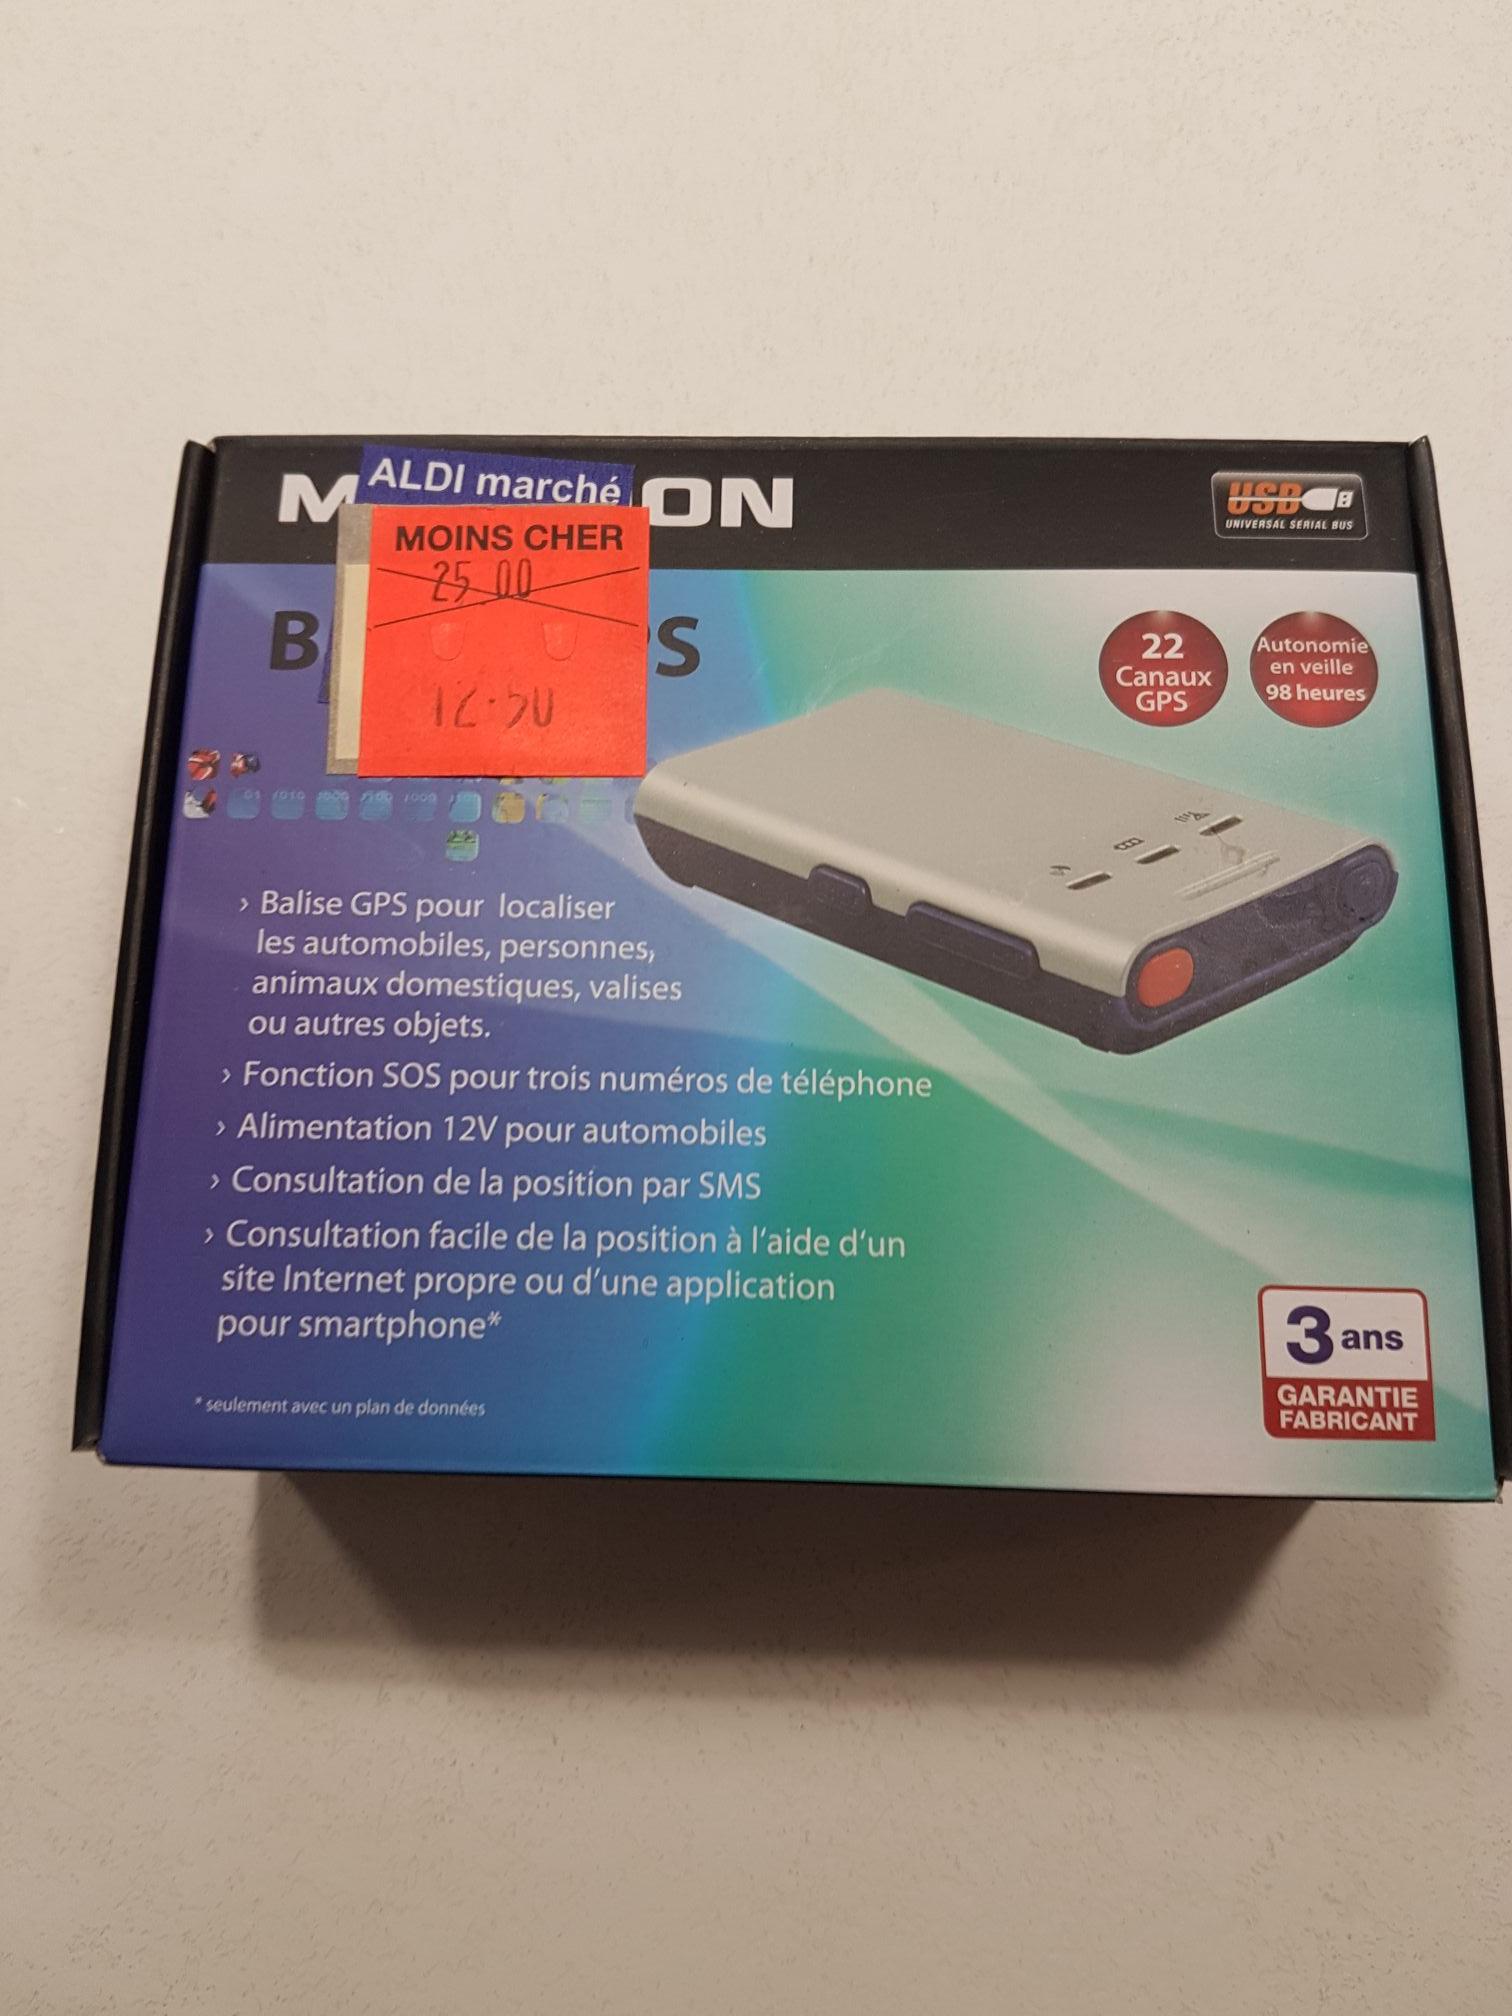 Balise GPS Maginon - Villers Outreaux (59)